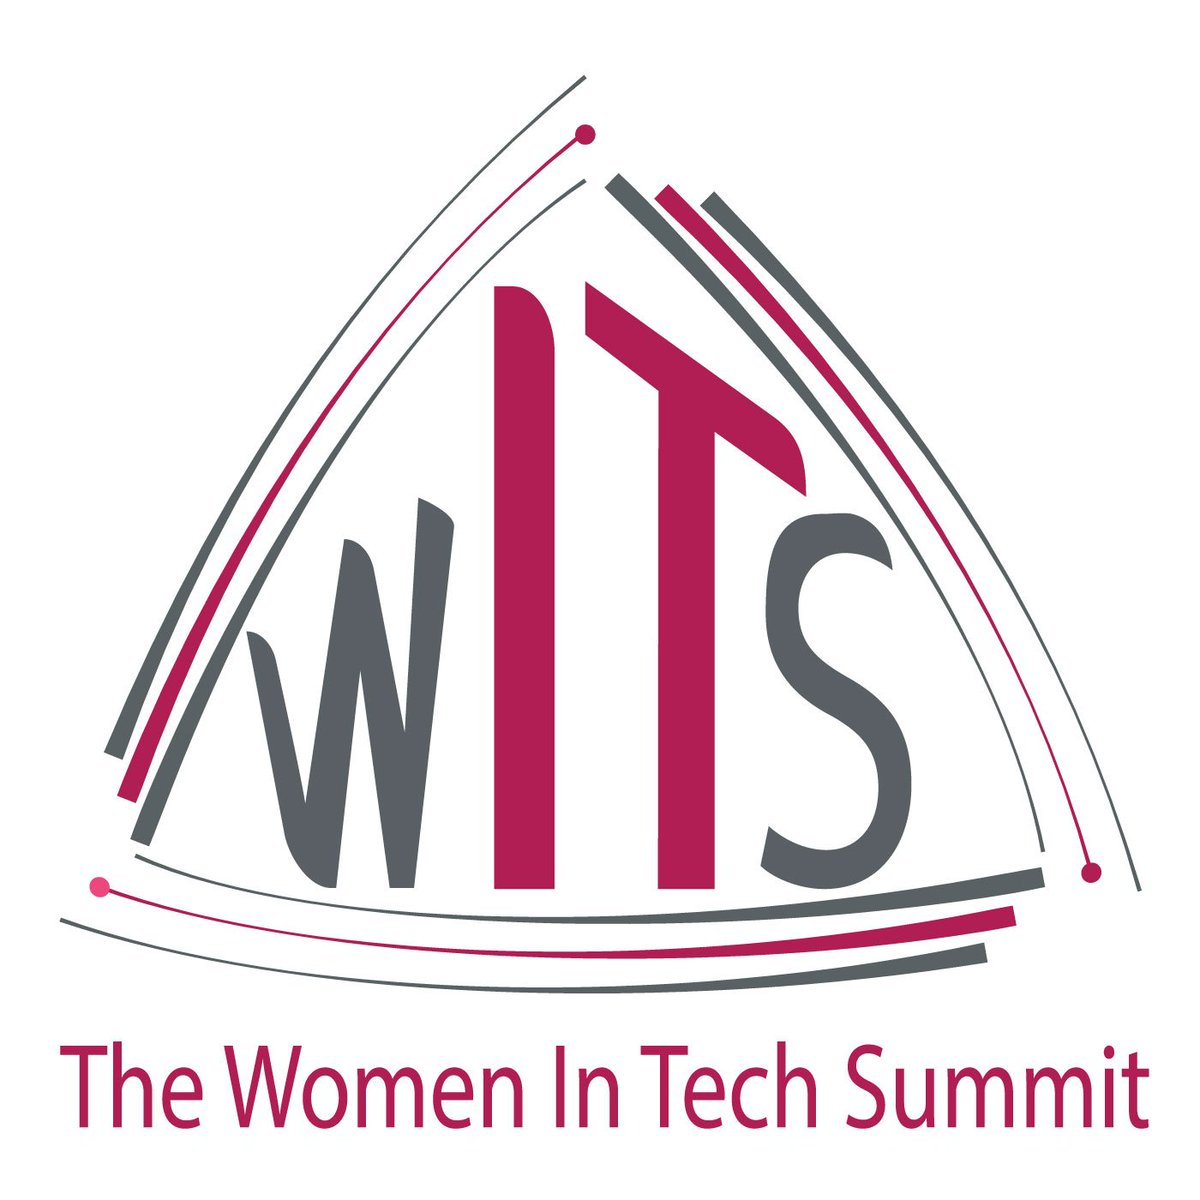 In October, @RTPfrontier will host the @WomenTechSummit! @GloriaBell gave us the scoop. https://t.co/LA3ltPbbjH https://t.co/D4yUHFuODh